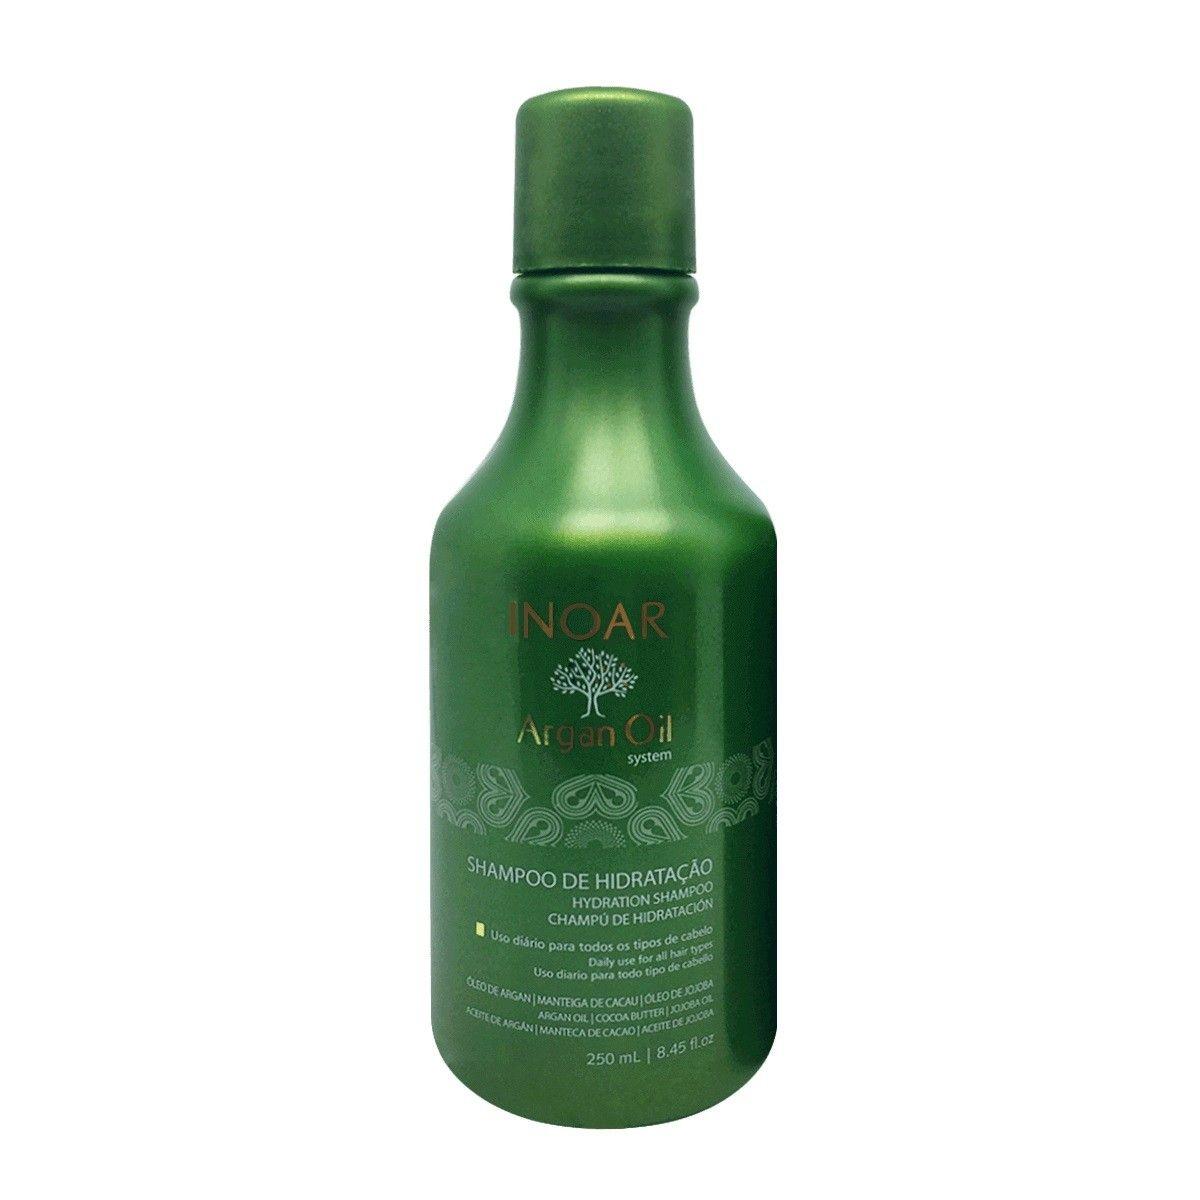 Inoar Shampoo Hidratação Argan Oil System - 250ml